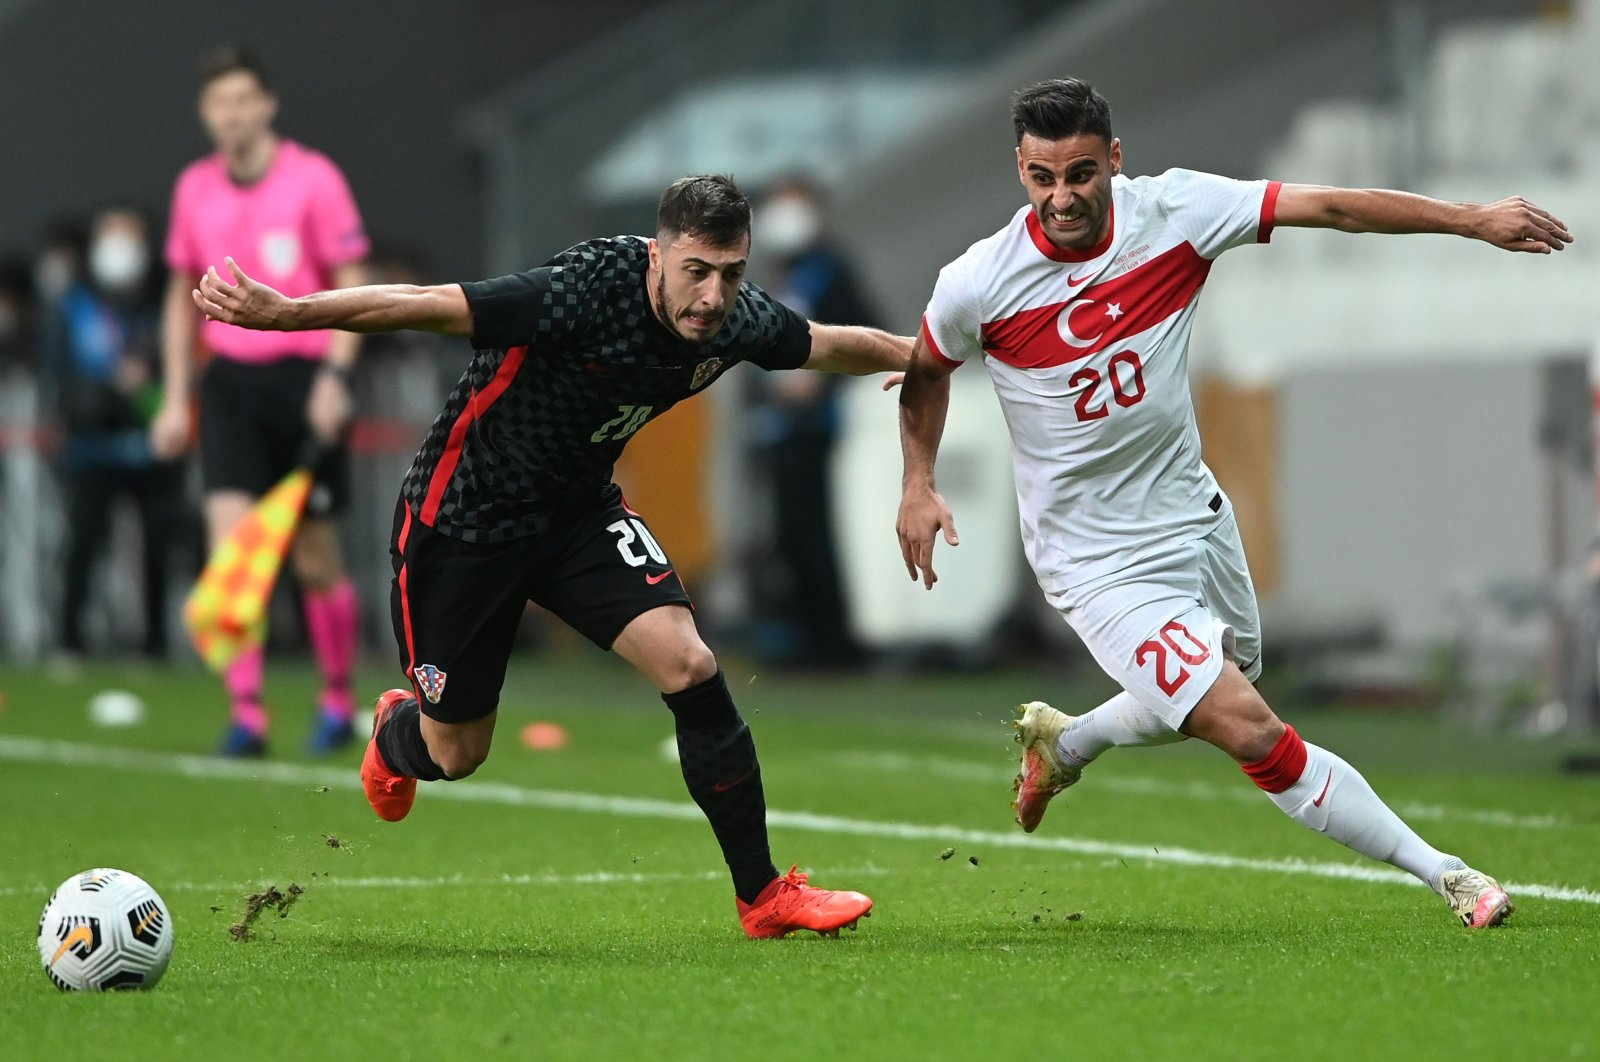 Croatia's Josip Juranovic (L) challenges Turkey's Deniz Türüç during a friendly match in Istanbul, Turkey, Nov. 11, 2020. (AFP Photo)